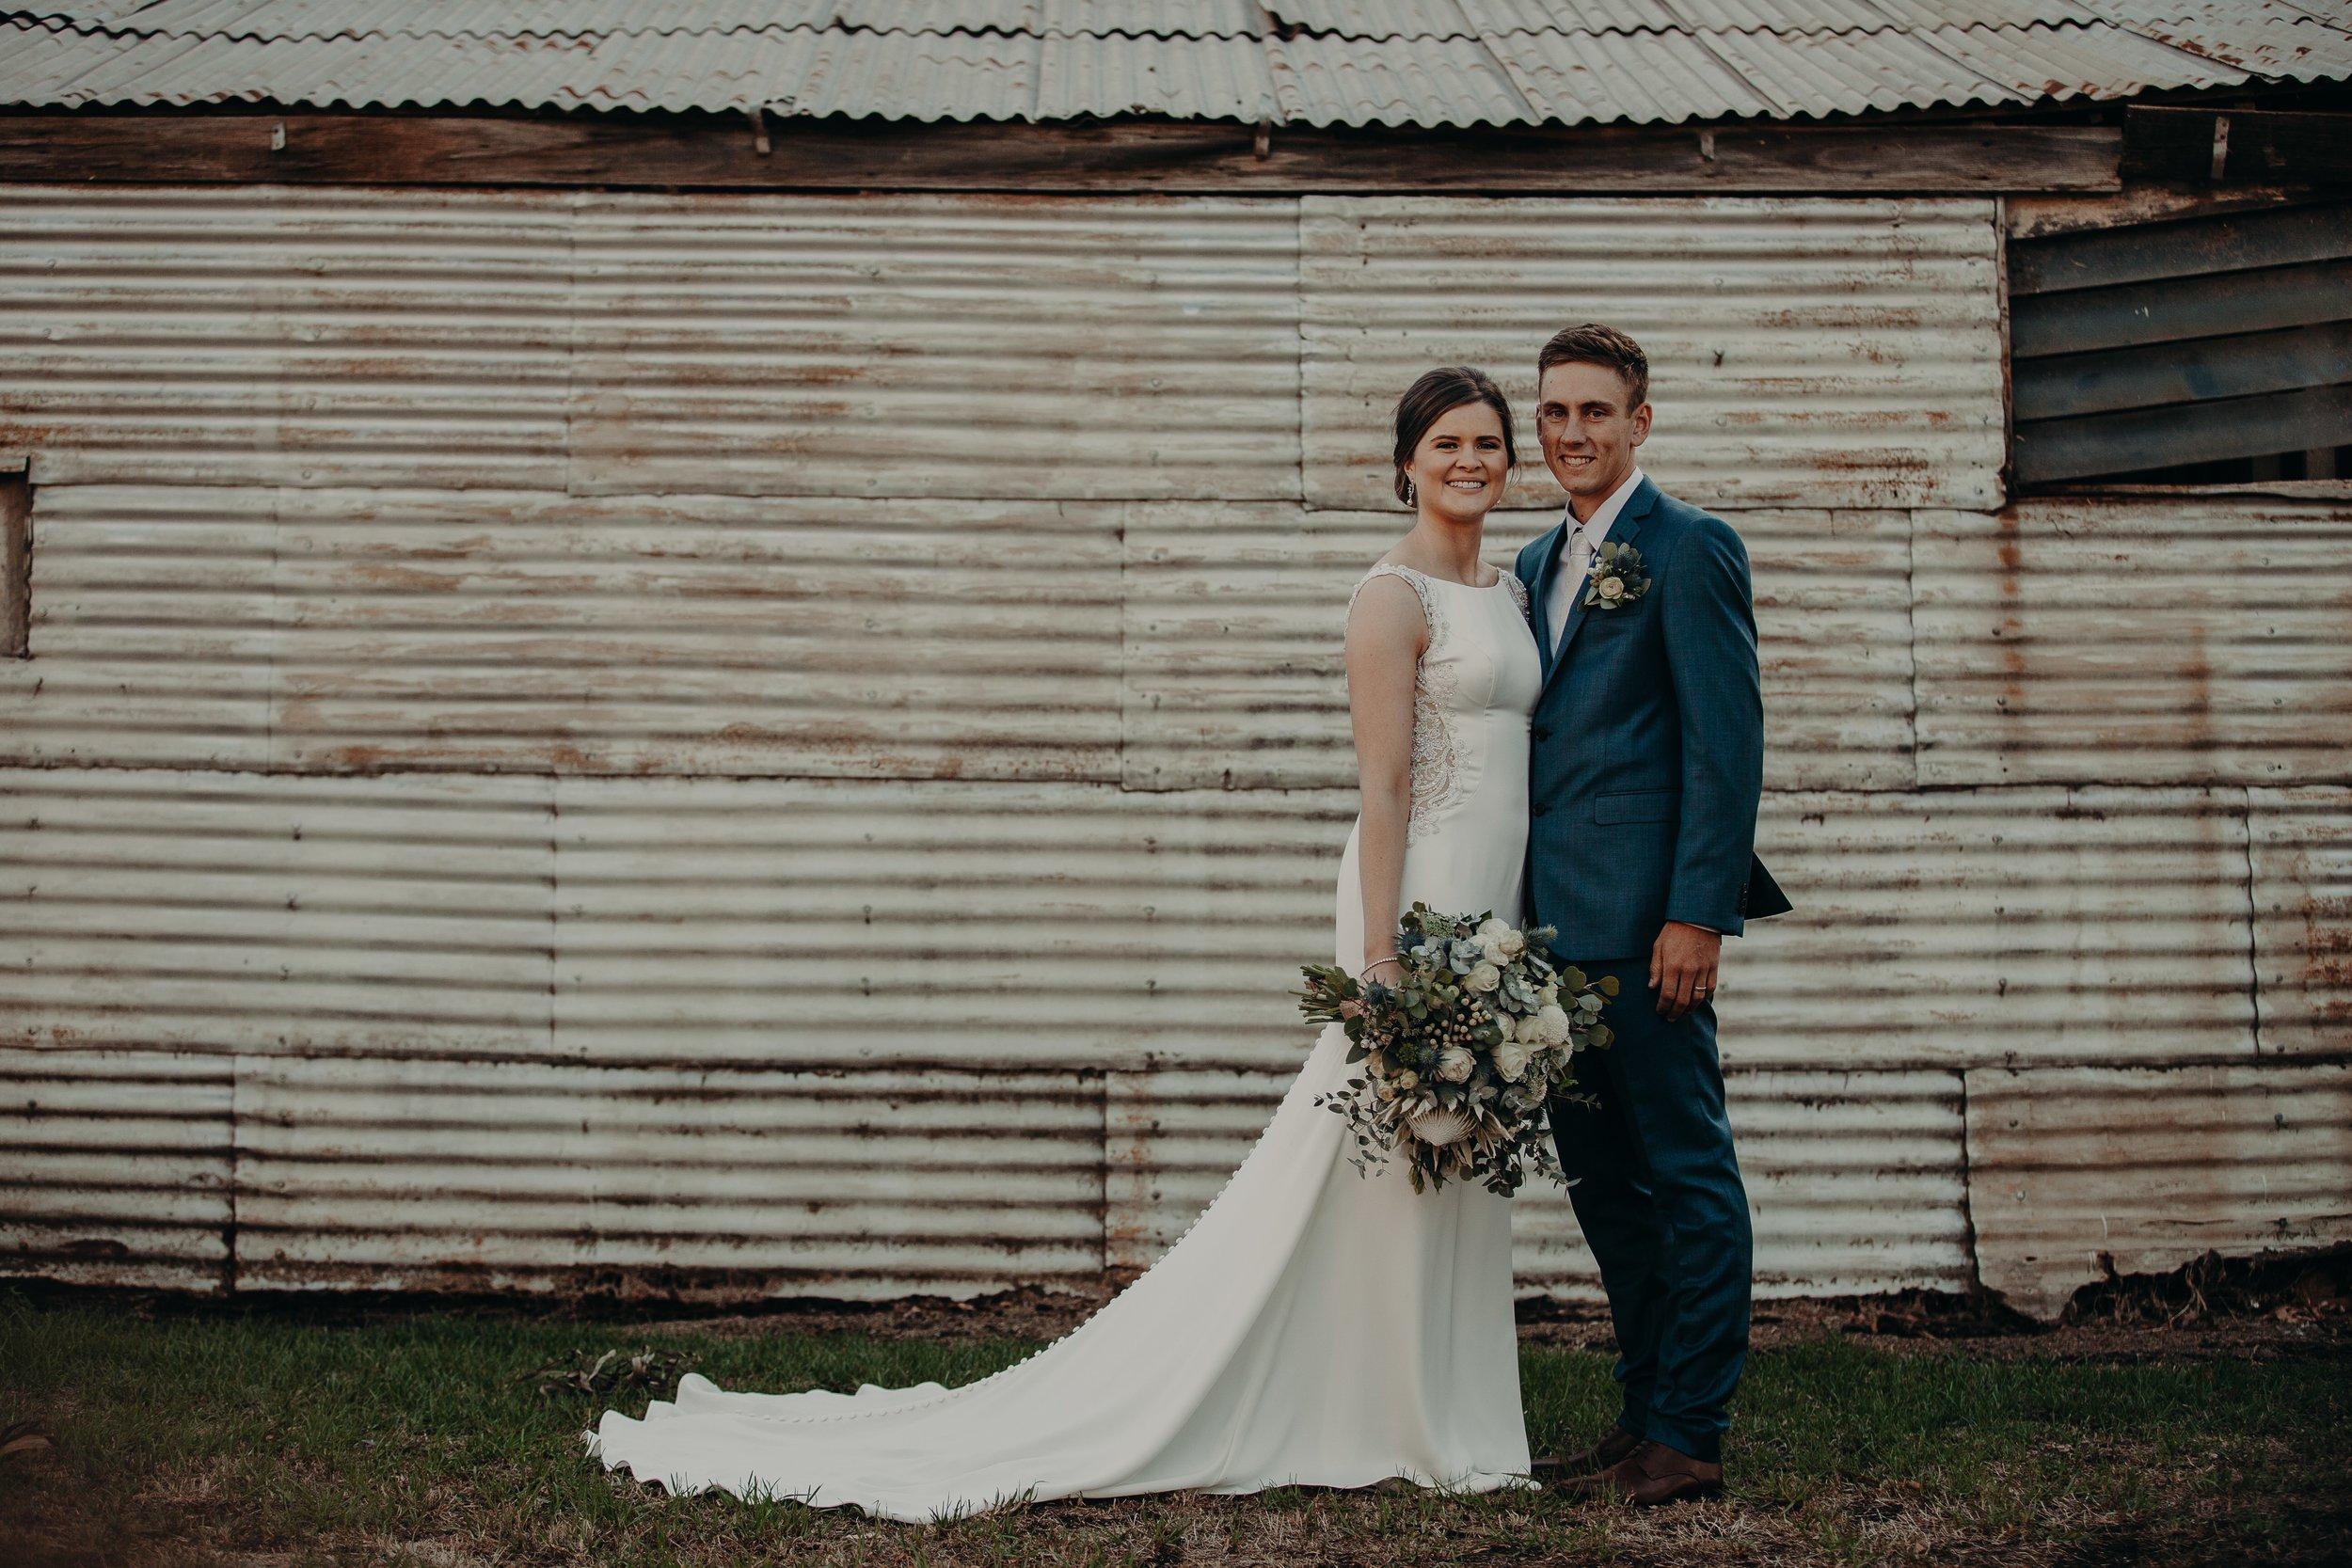 mickalathomas_puremacphotography_weddingphotographer_couplephotographer_Sheppartonphotographer_2551.jpg